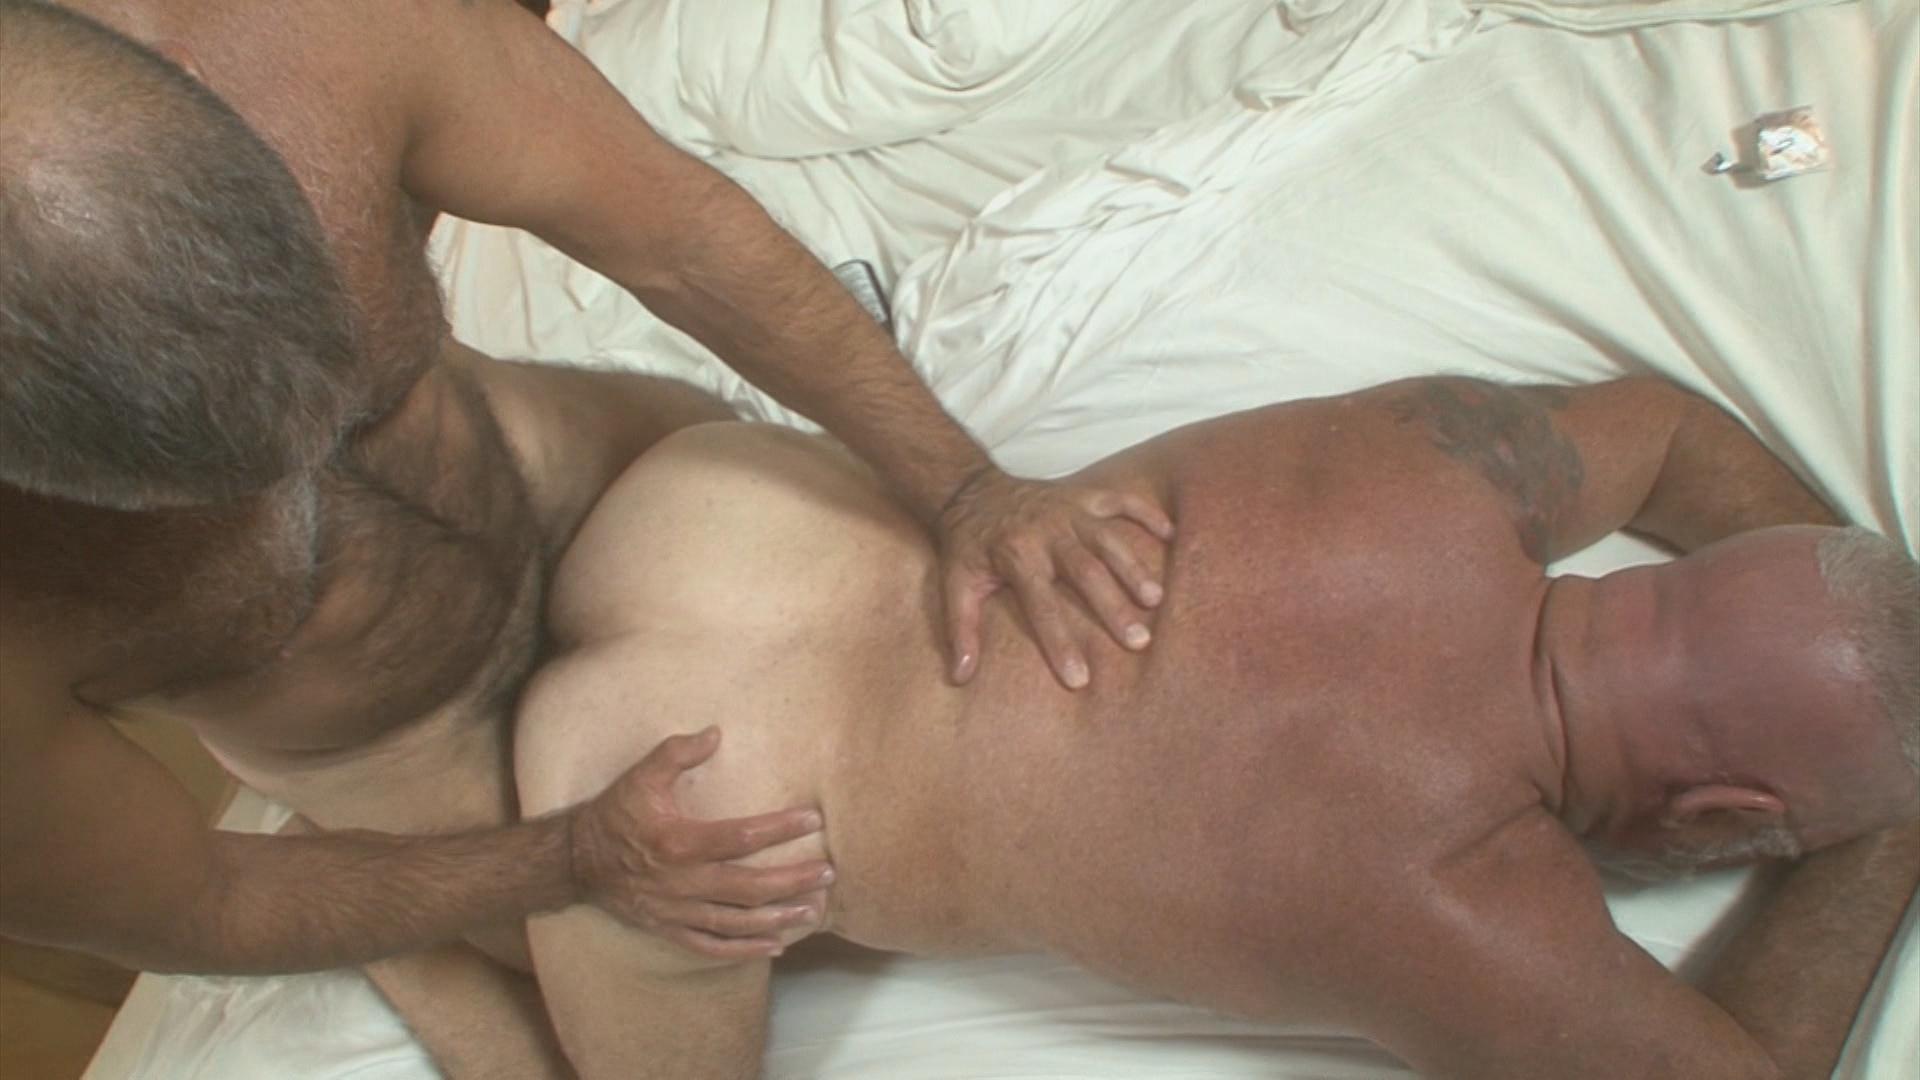 Real Men 29: Brief Buddies Xvideo gay